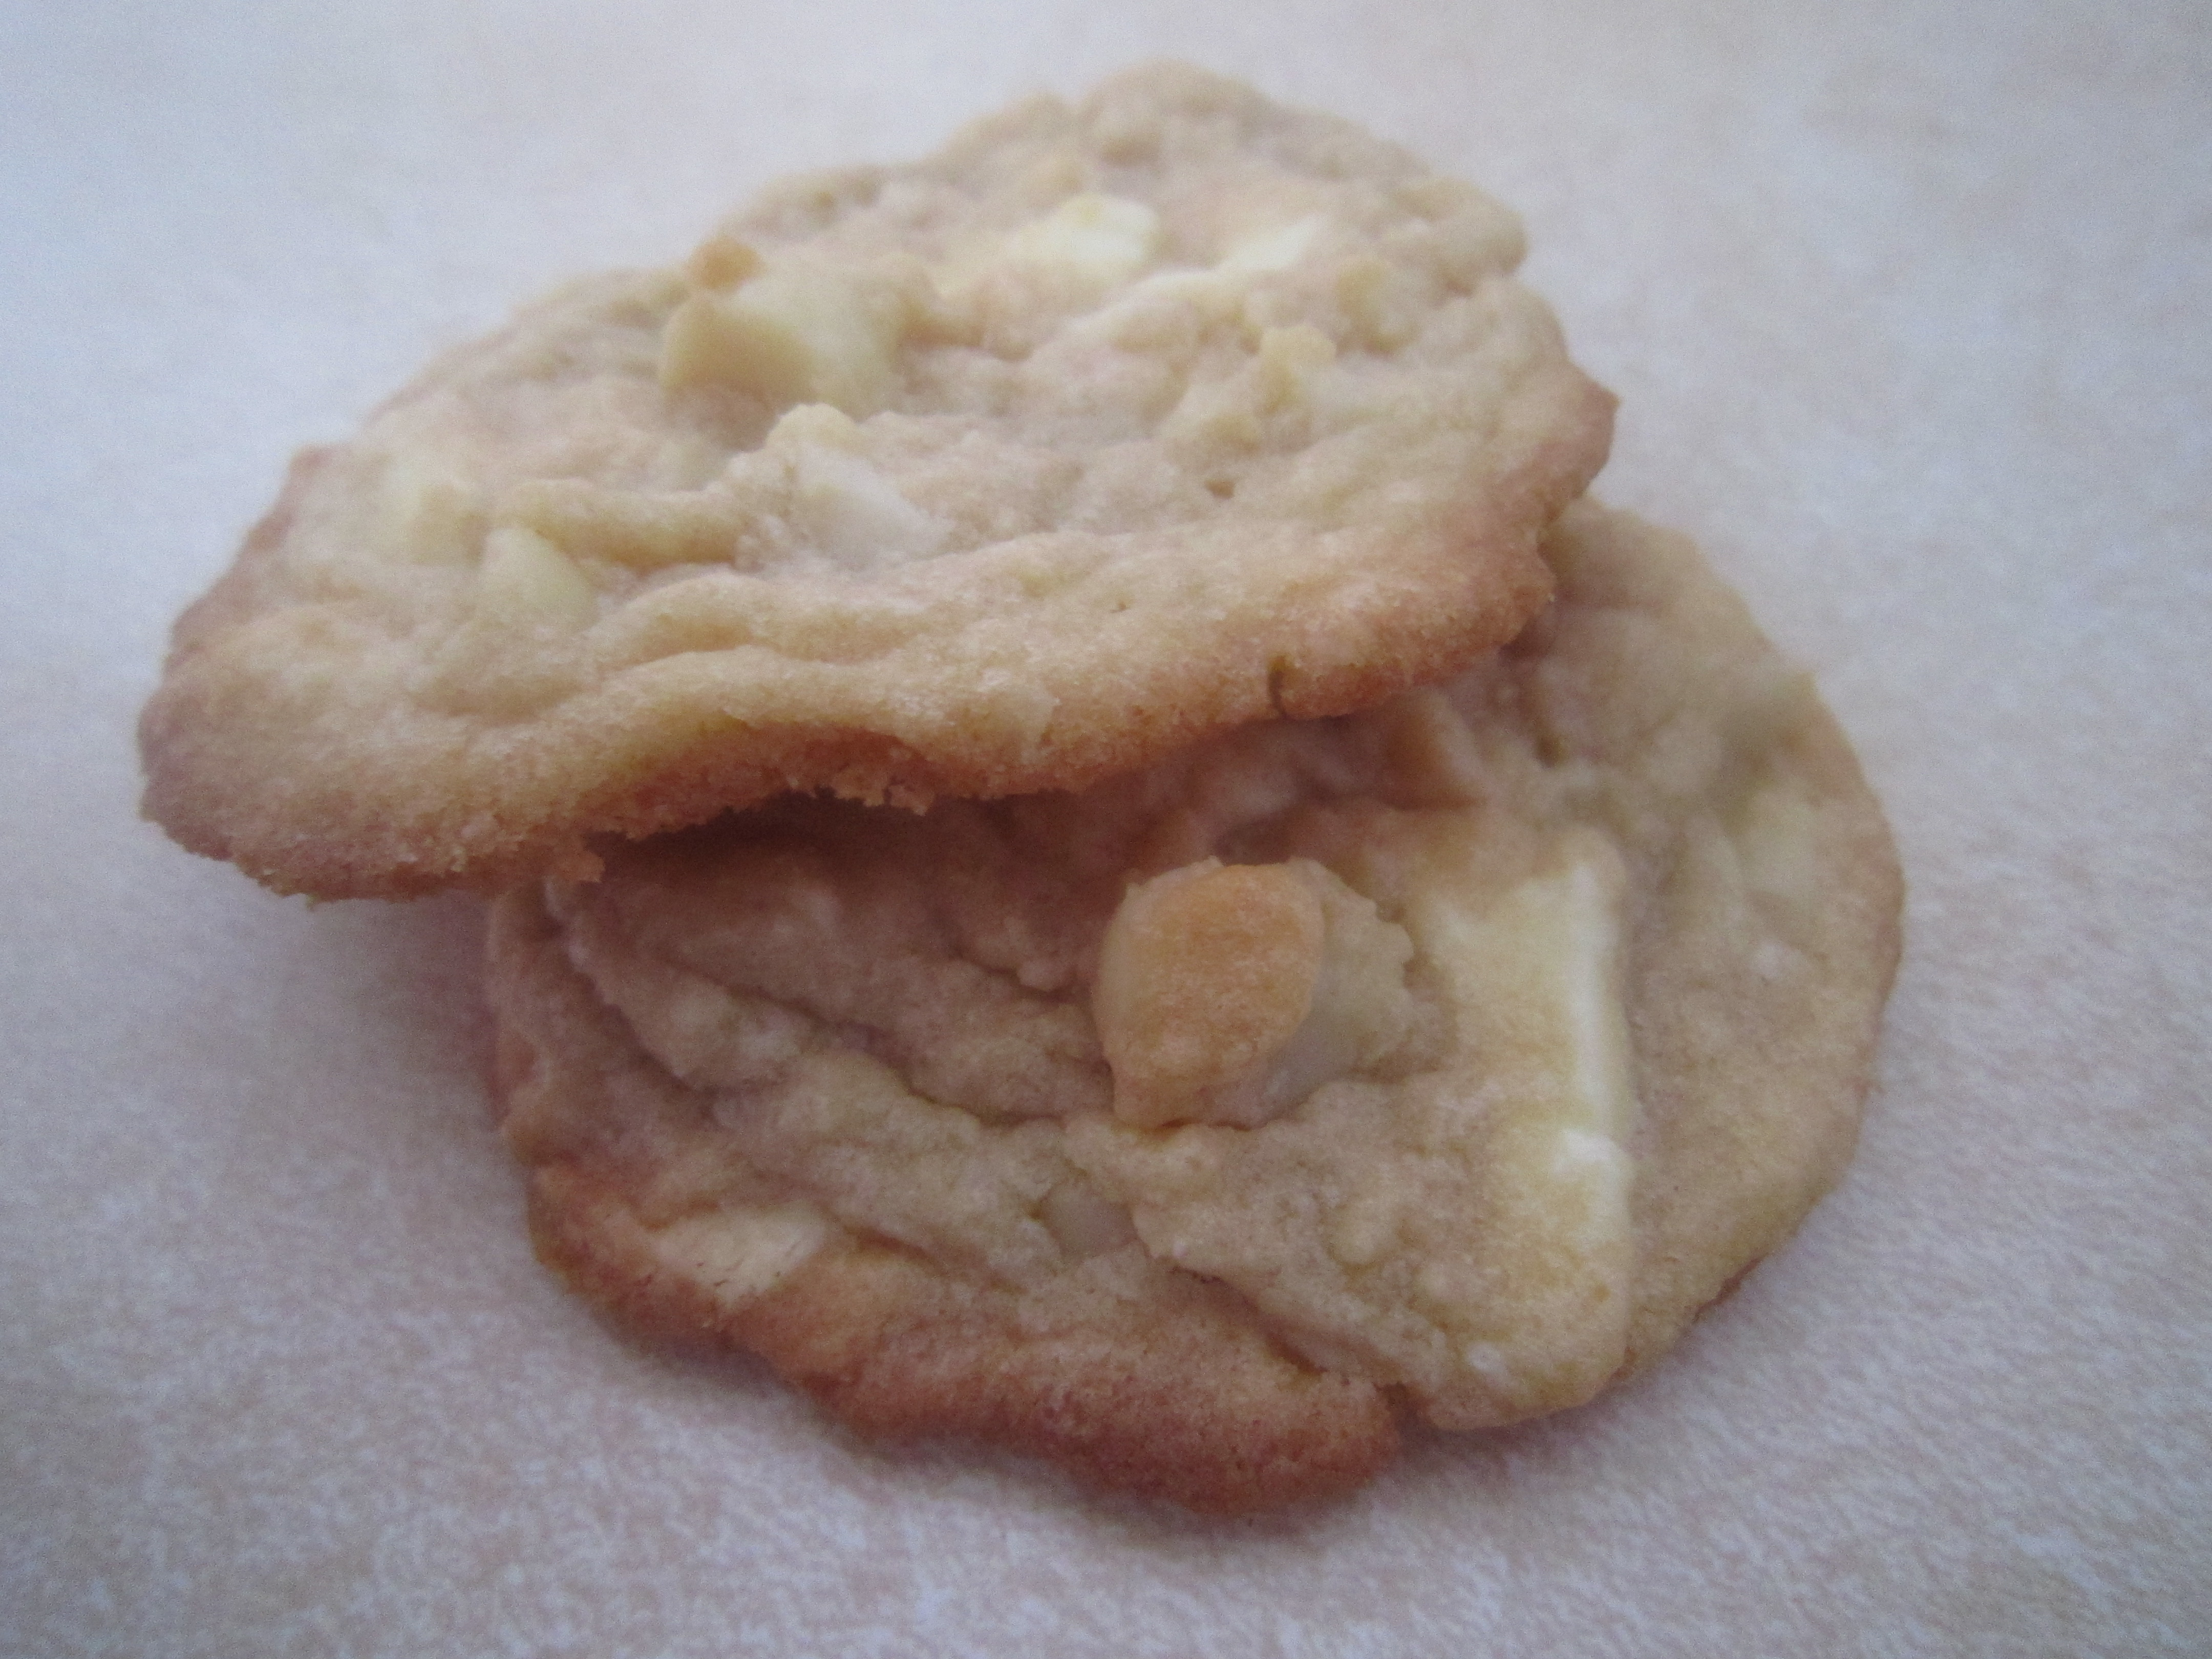 To begin, combine flour, baking soda, and salt in a medium bowl.